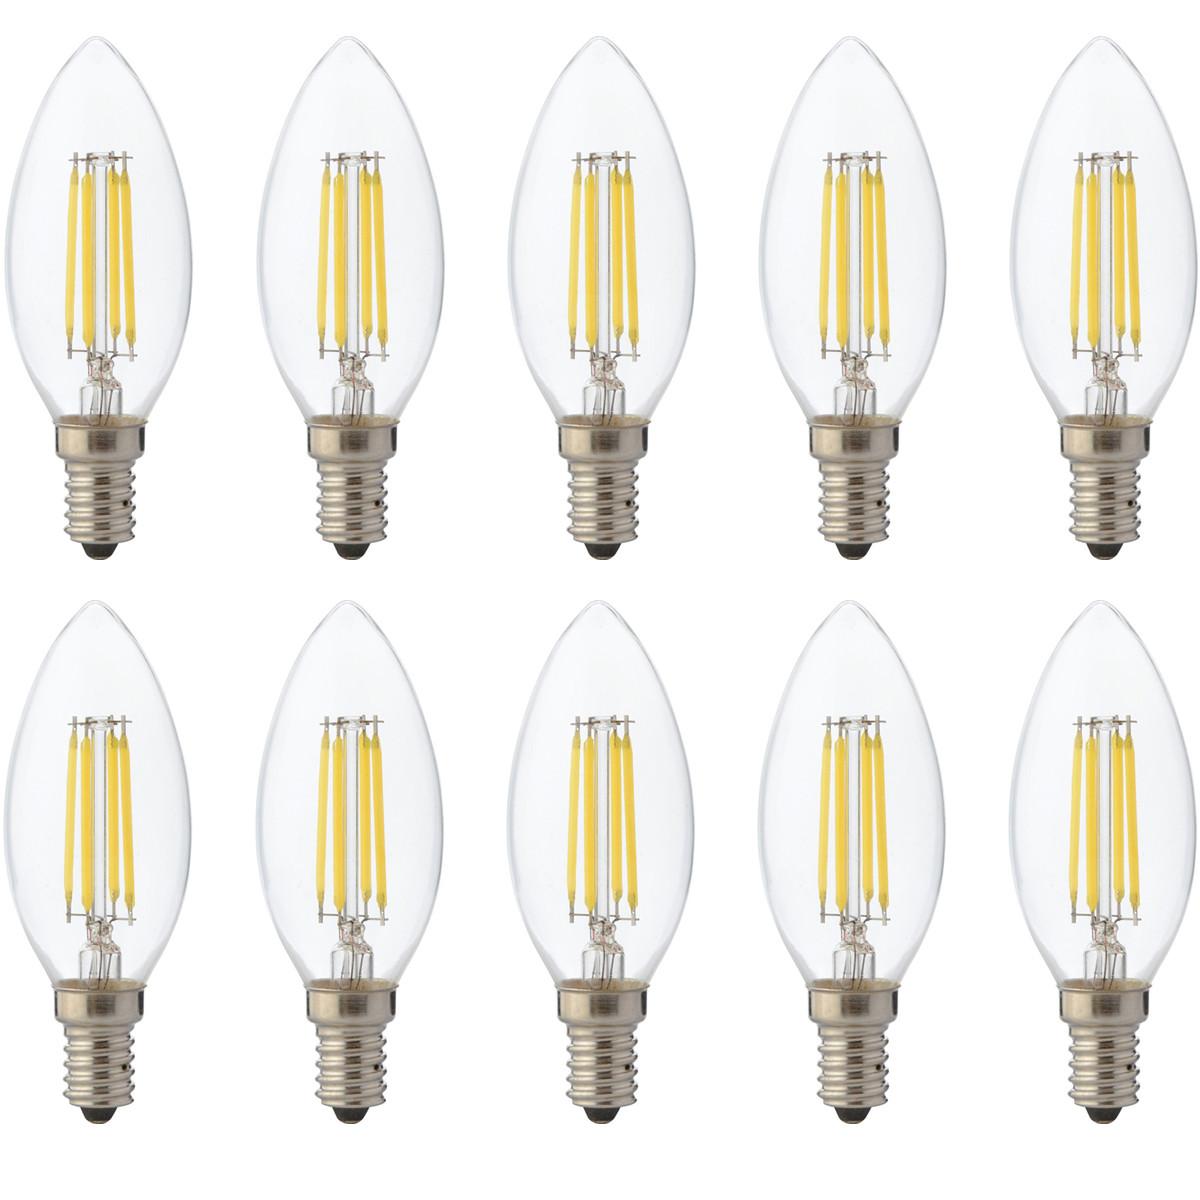 LED Lamp 10 Pack - Kaarslamp - Filament - E14 Fitting - 4W Dimbaar - Warm Wit 2700K